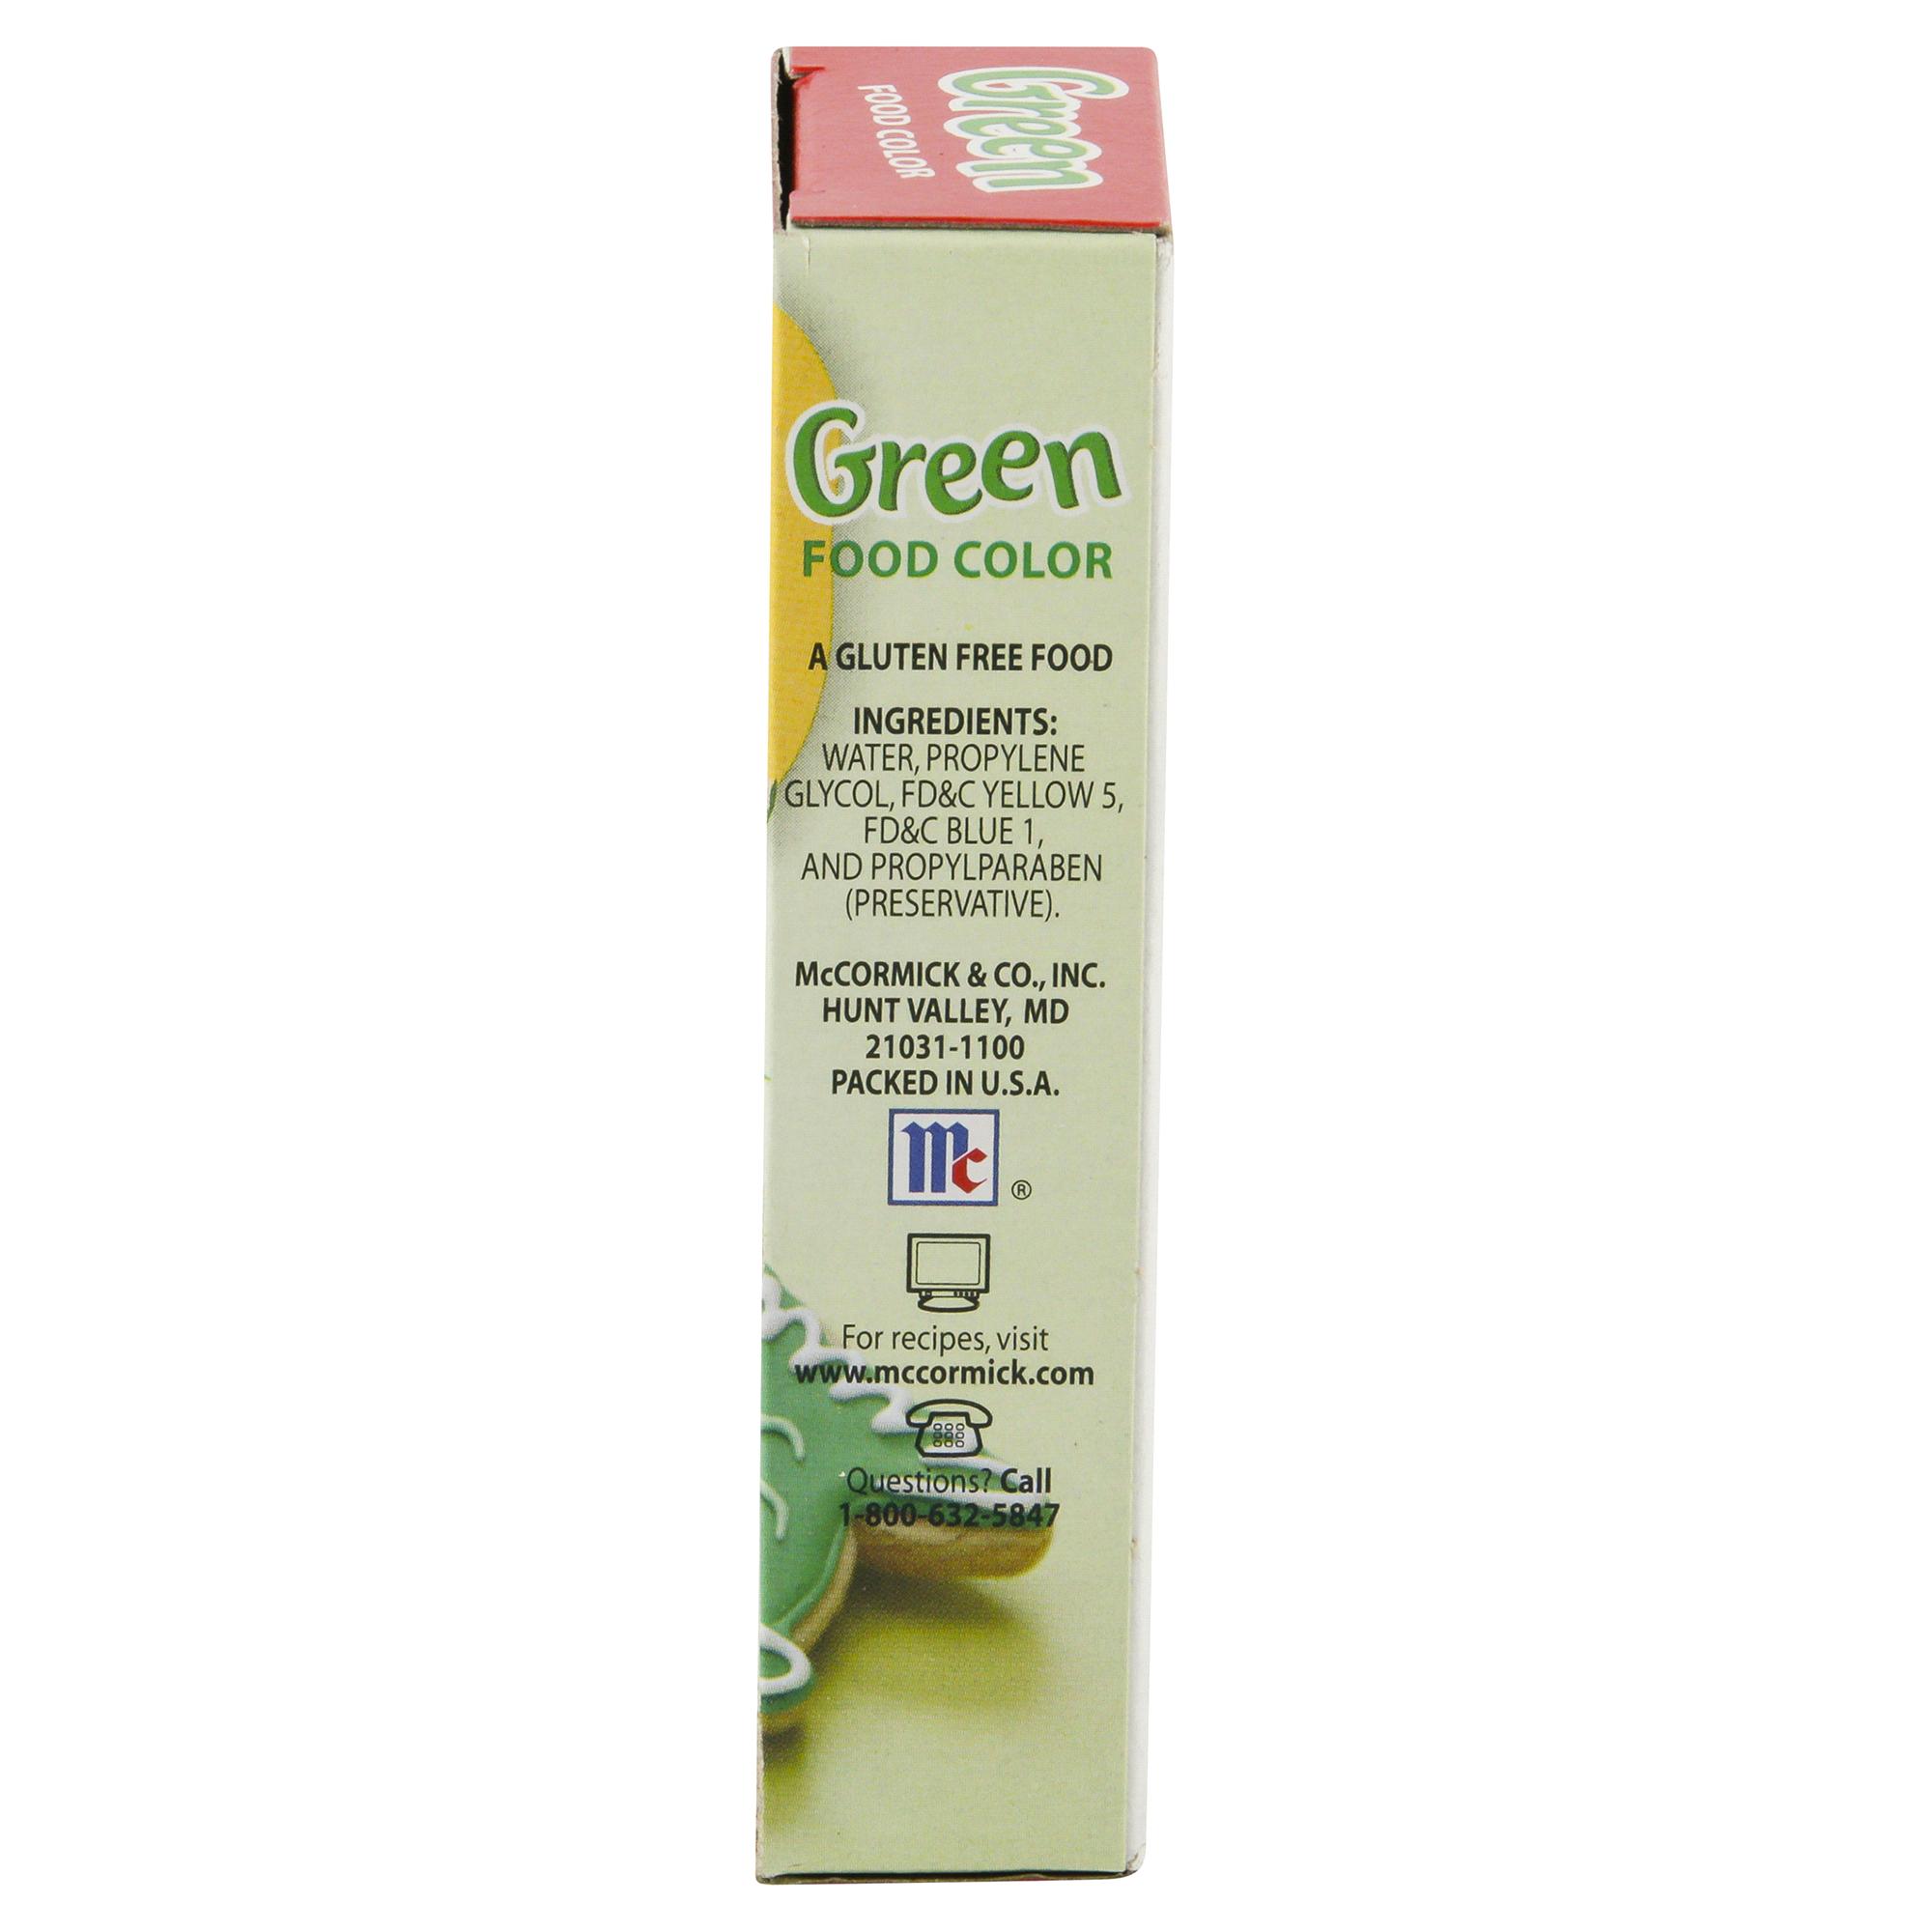 McCormick Green Food Color 1 oz | Meijer.com